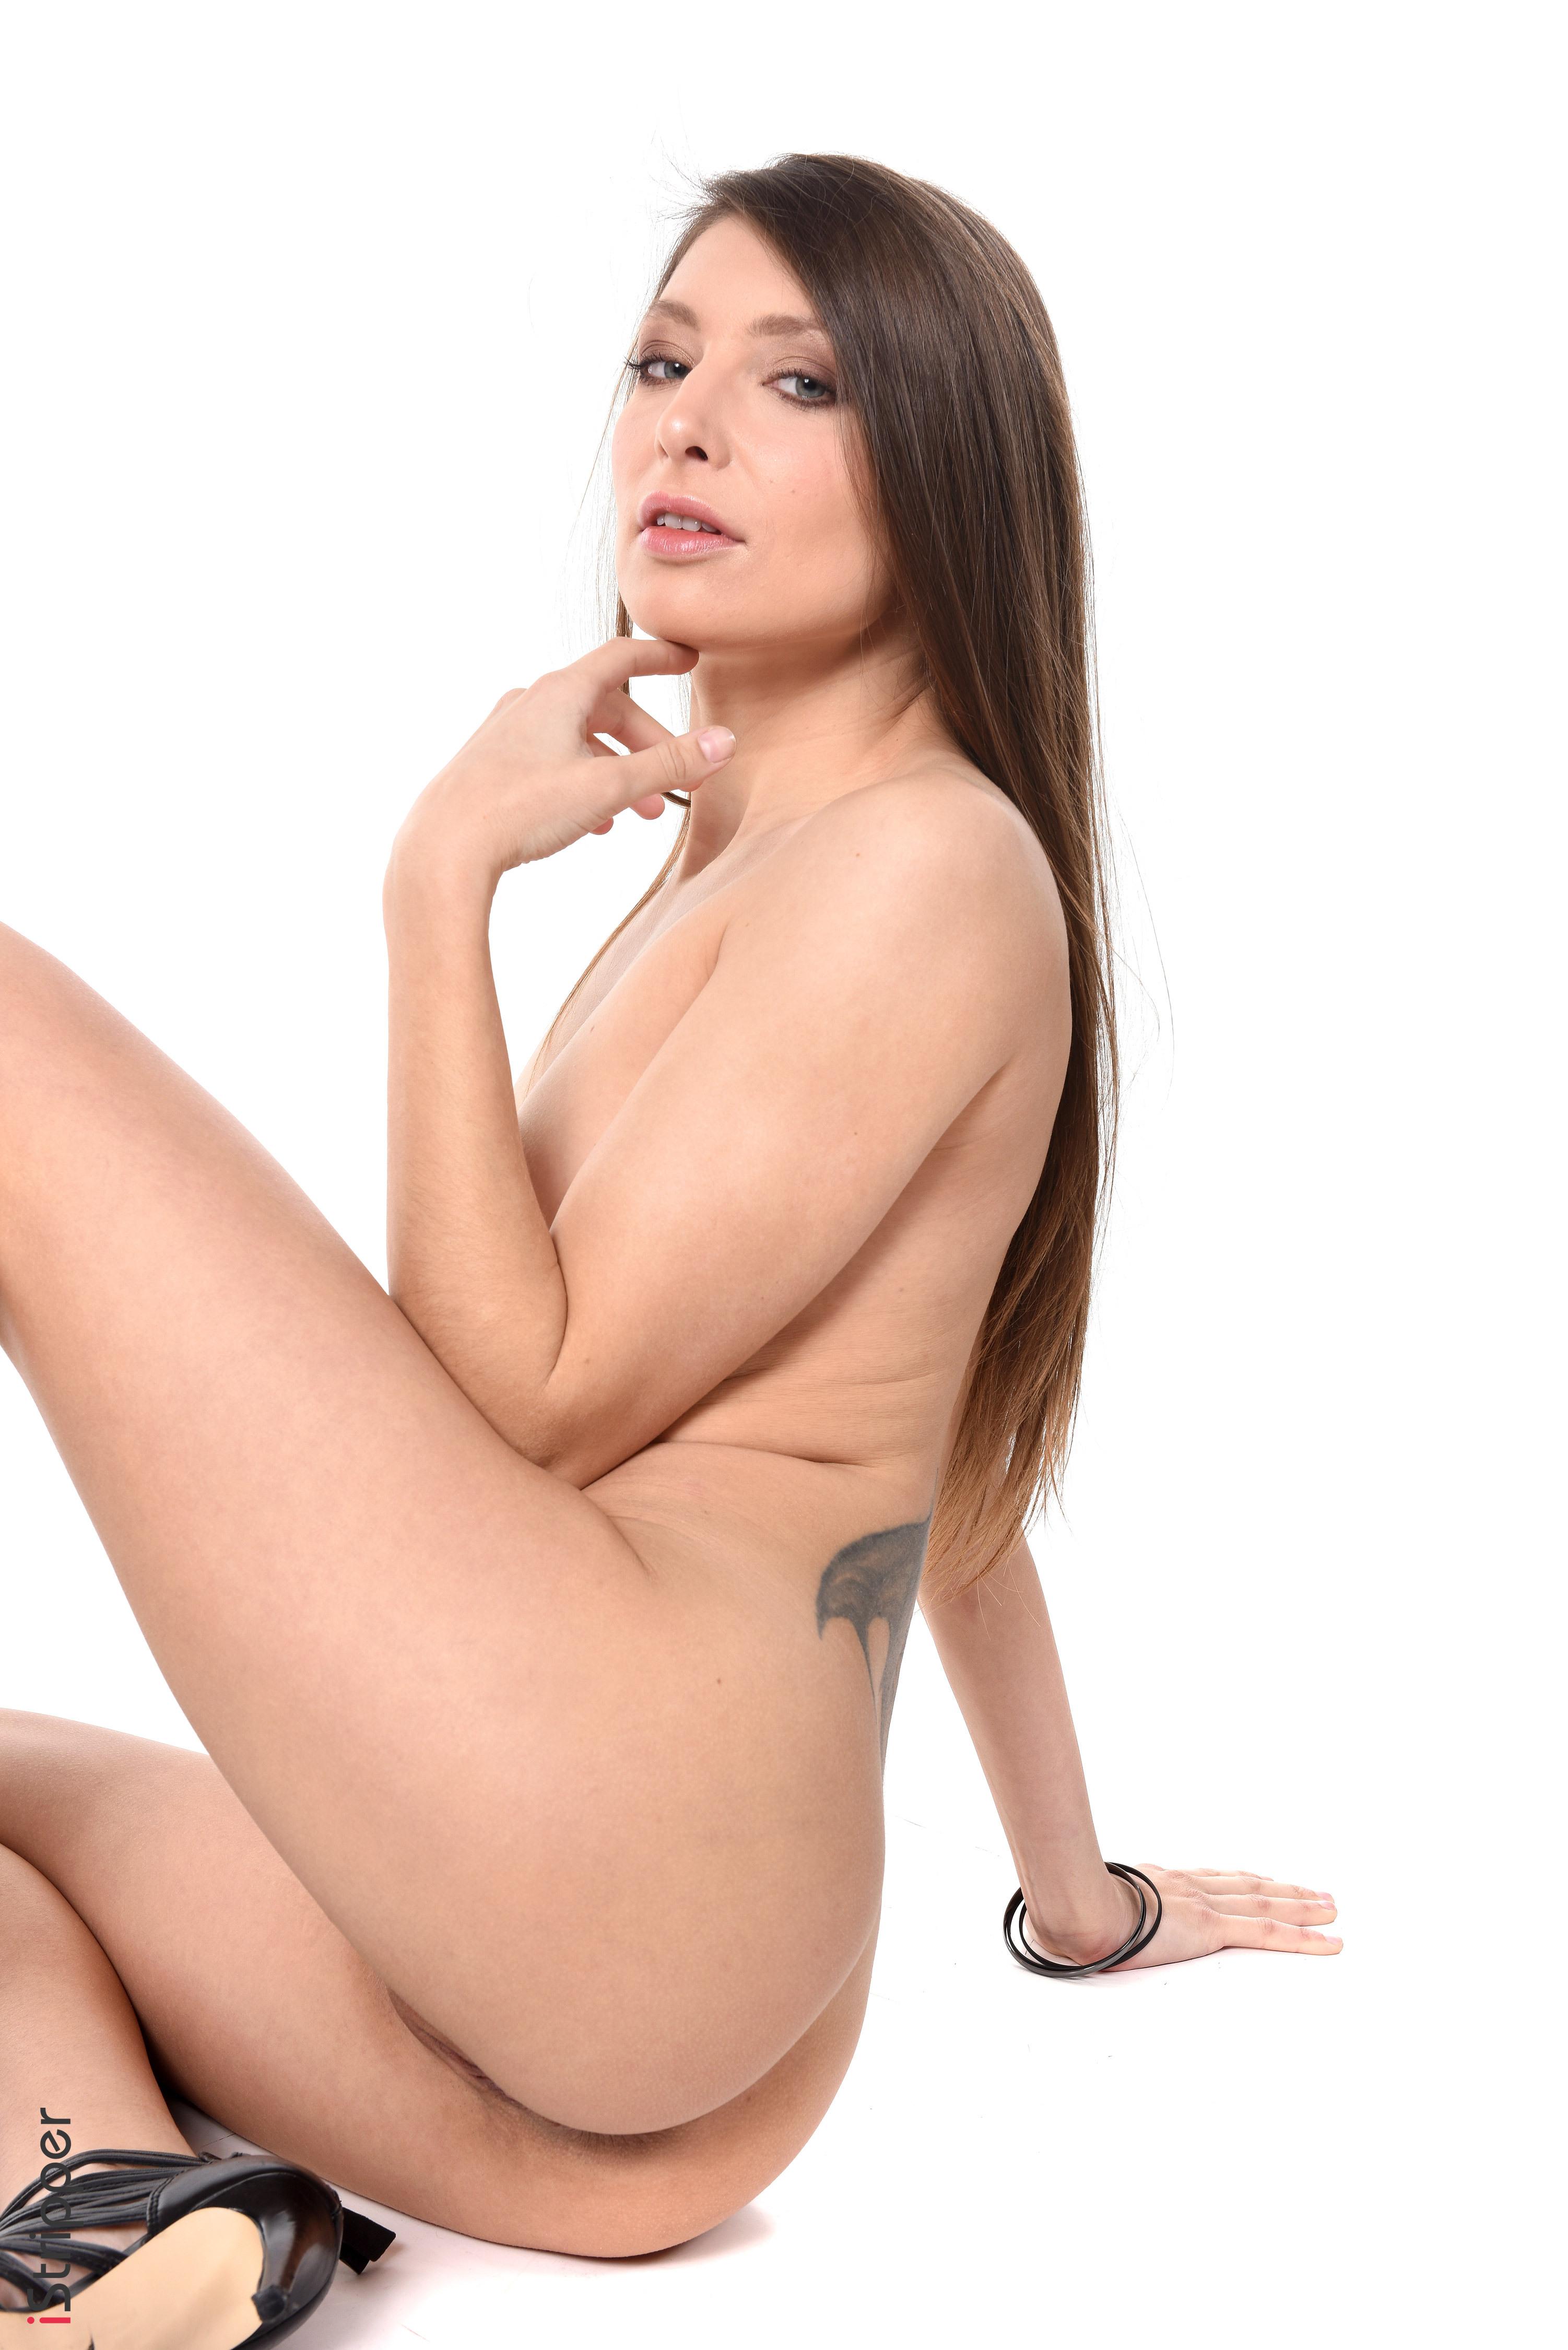 naked breast wallpaper